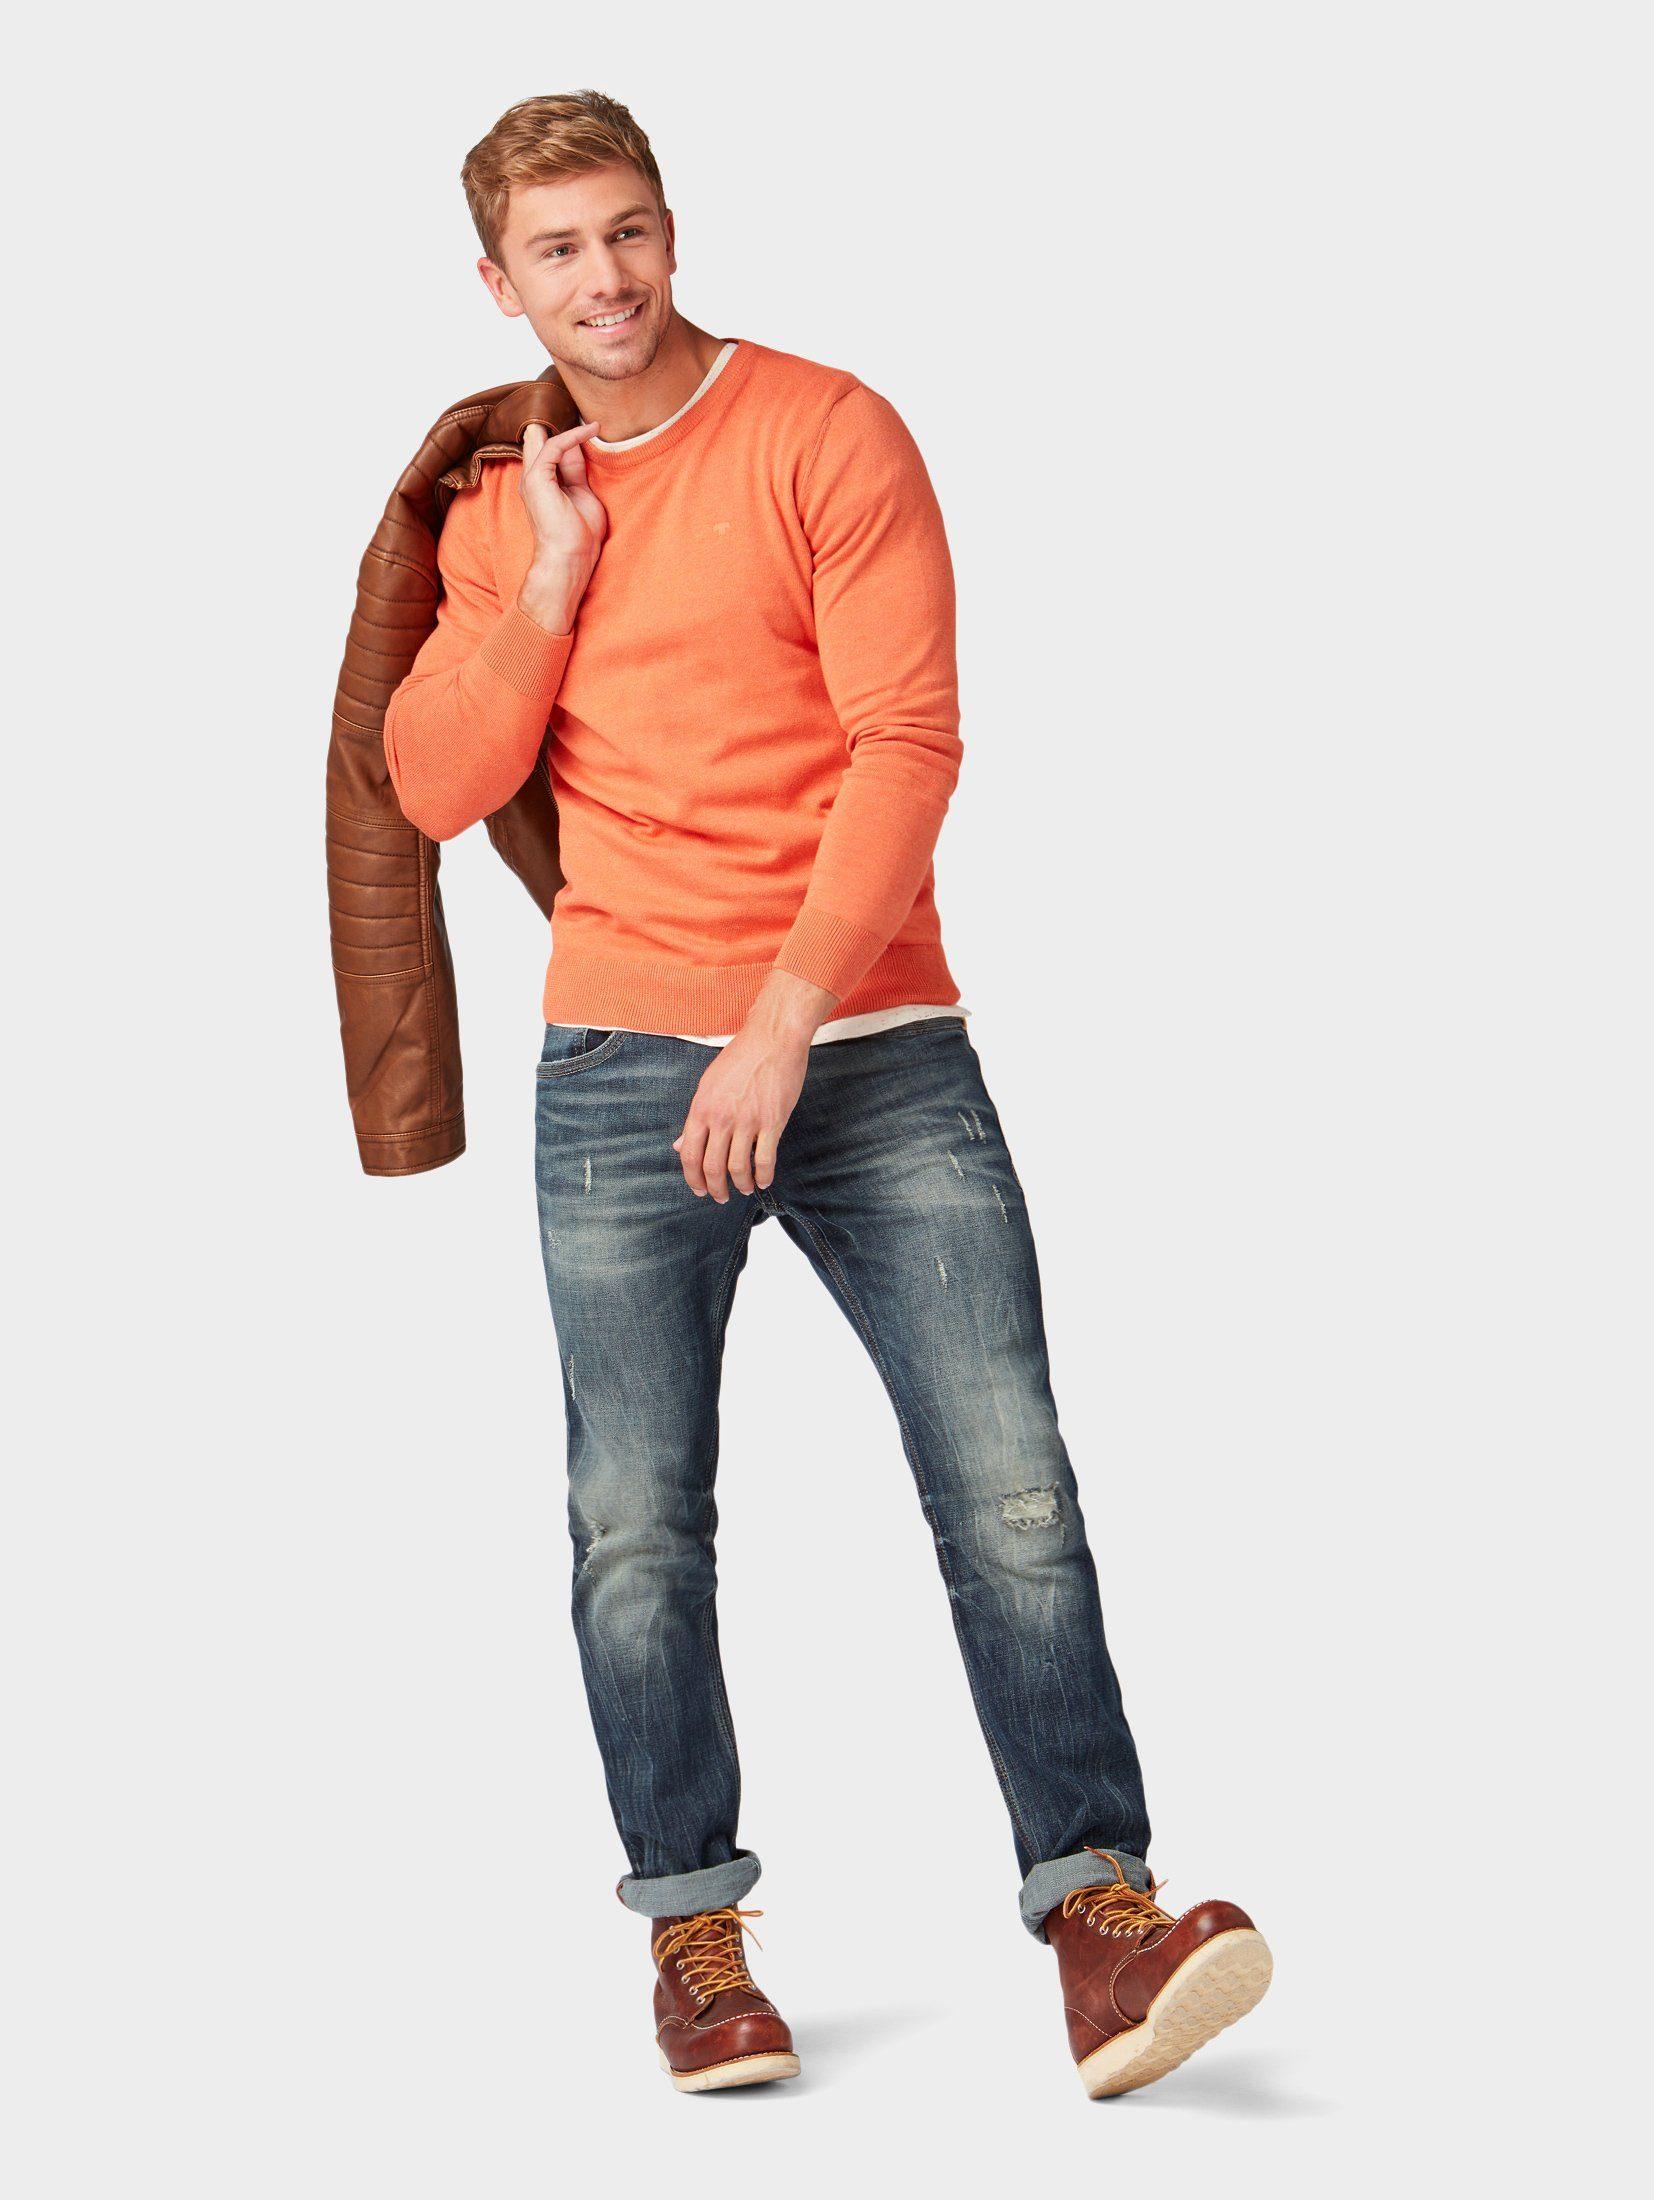 Tom Pullover« Strickpullover »melierter Tom Tailor Tailor »melierter Strickpullover Strickpullover Pullover« Tailor Tom KJcTlF1